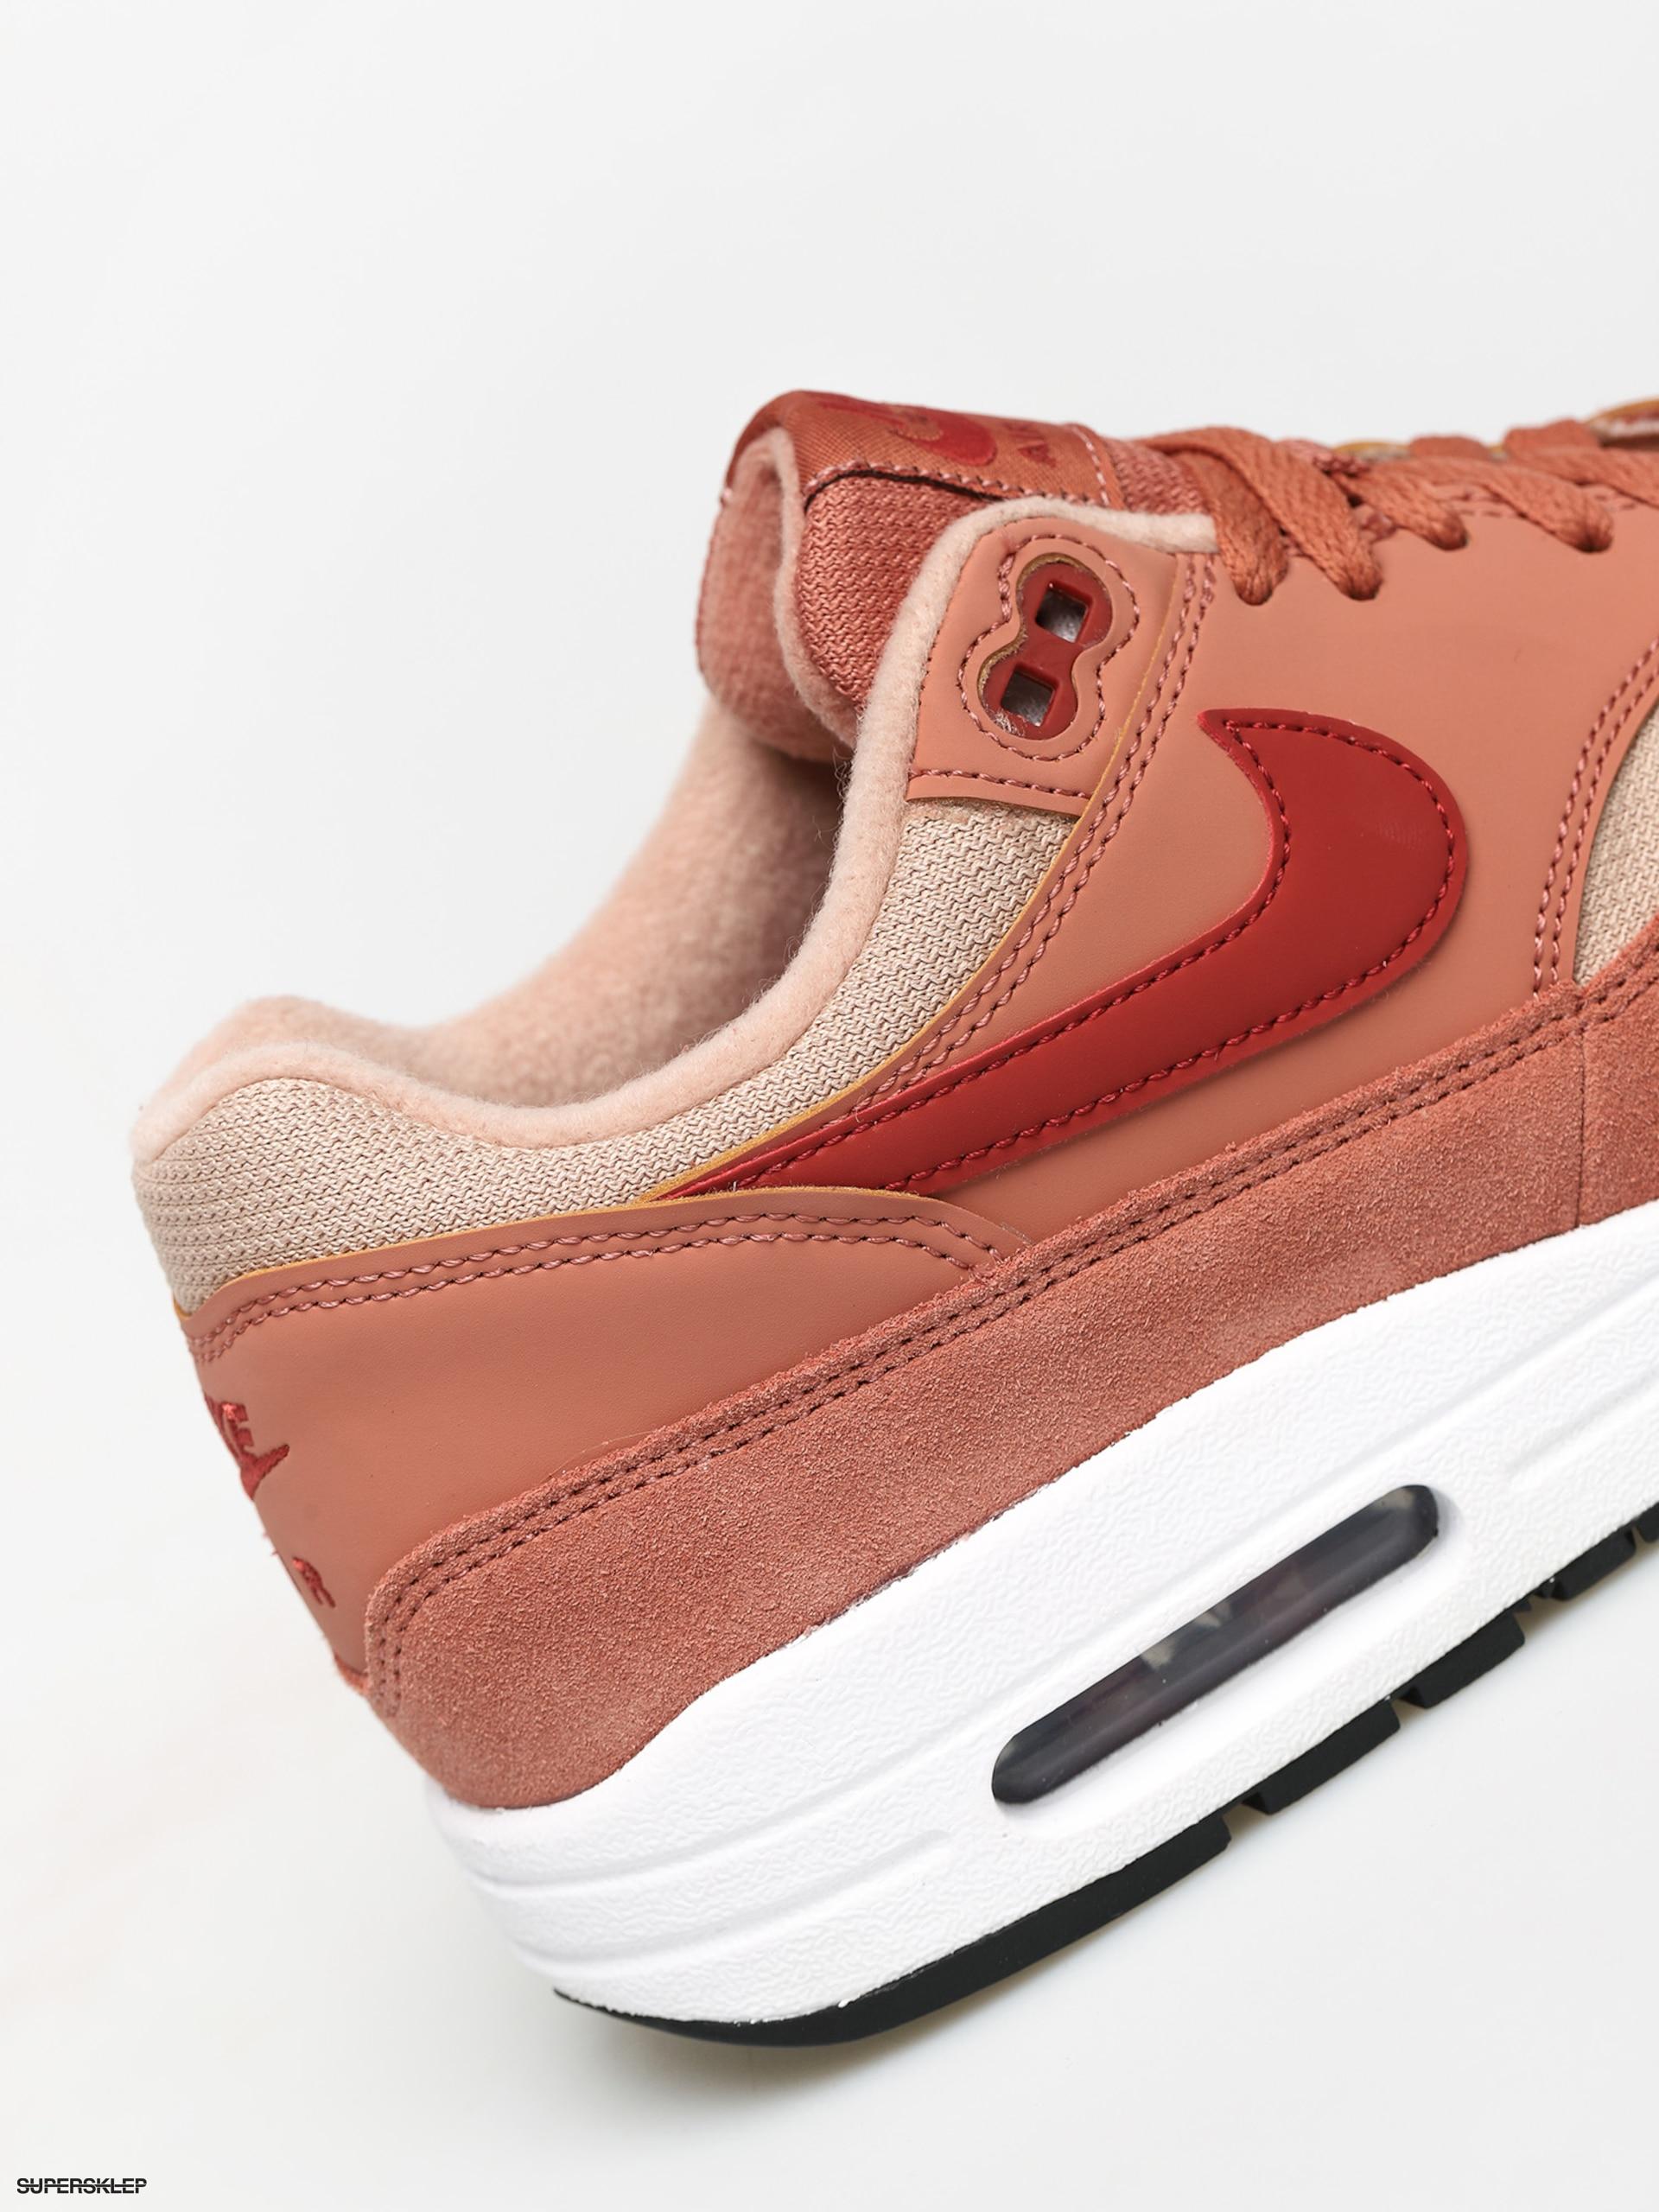 Buty Nike Air Max 1 Wmn (terra blushdune red bio beige black)